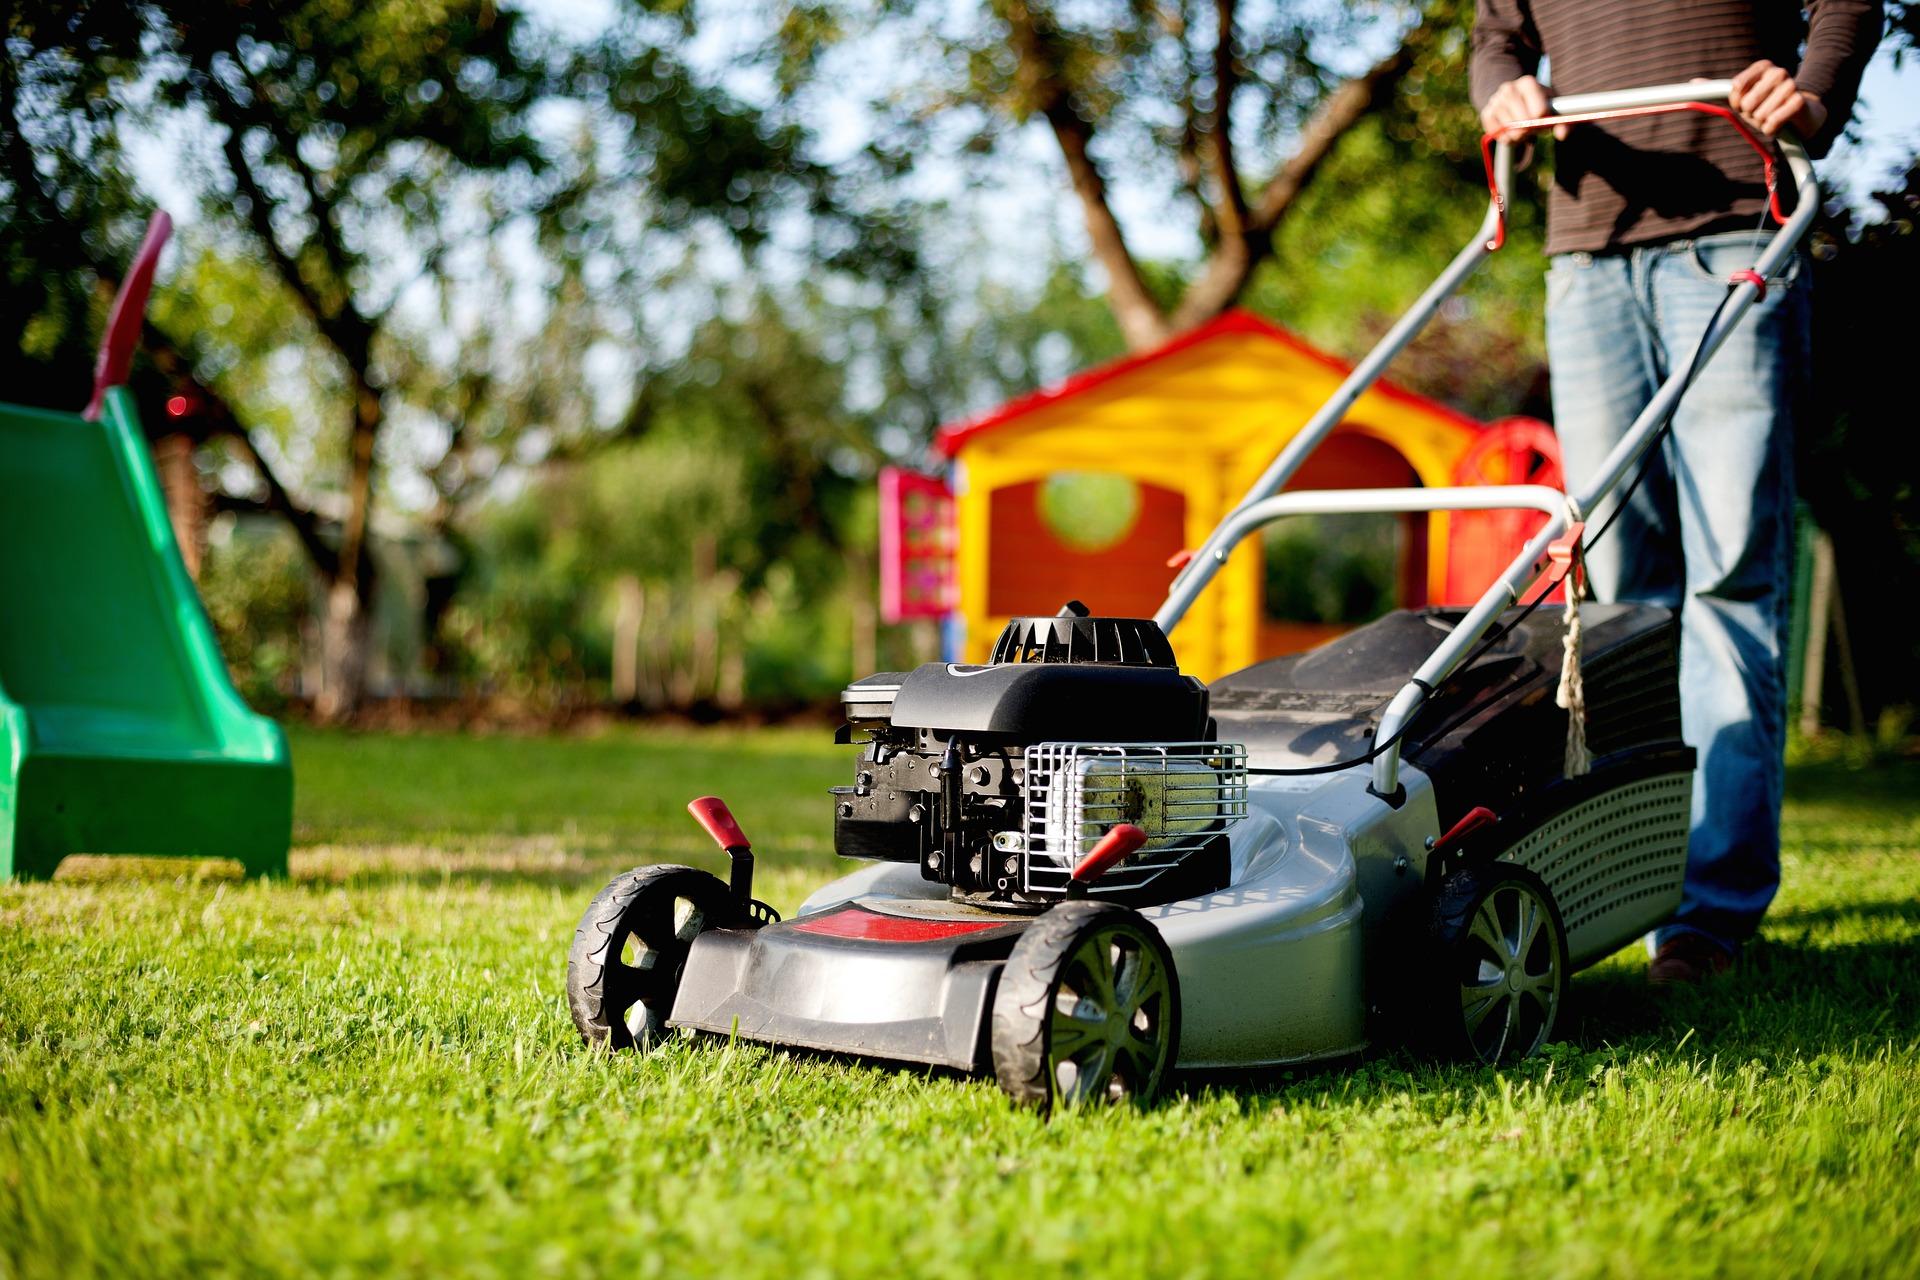 lawn-mower-2127637_1920